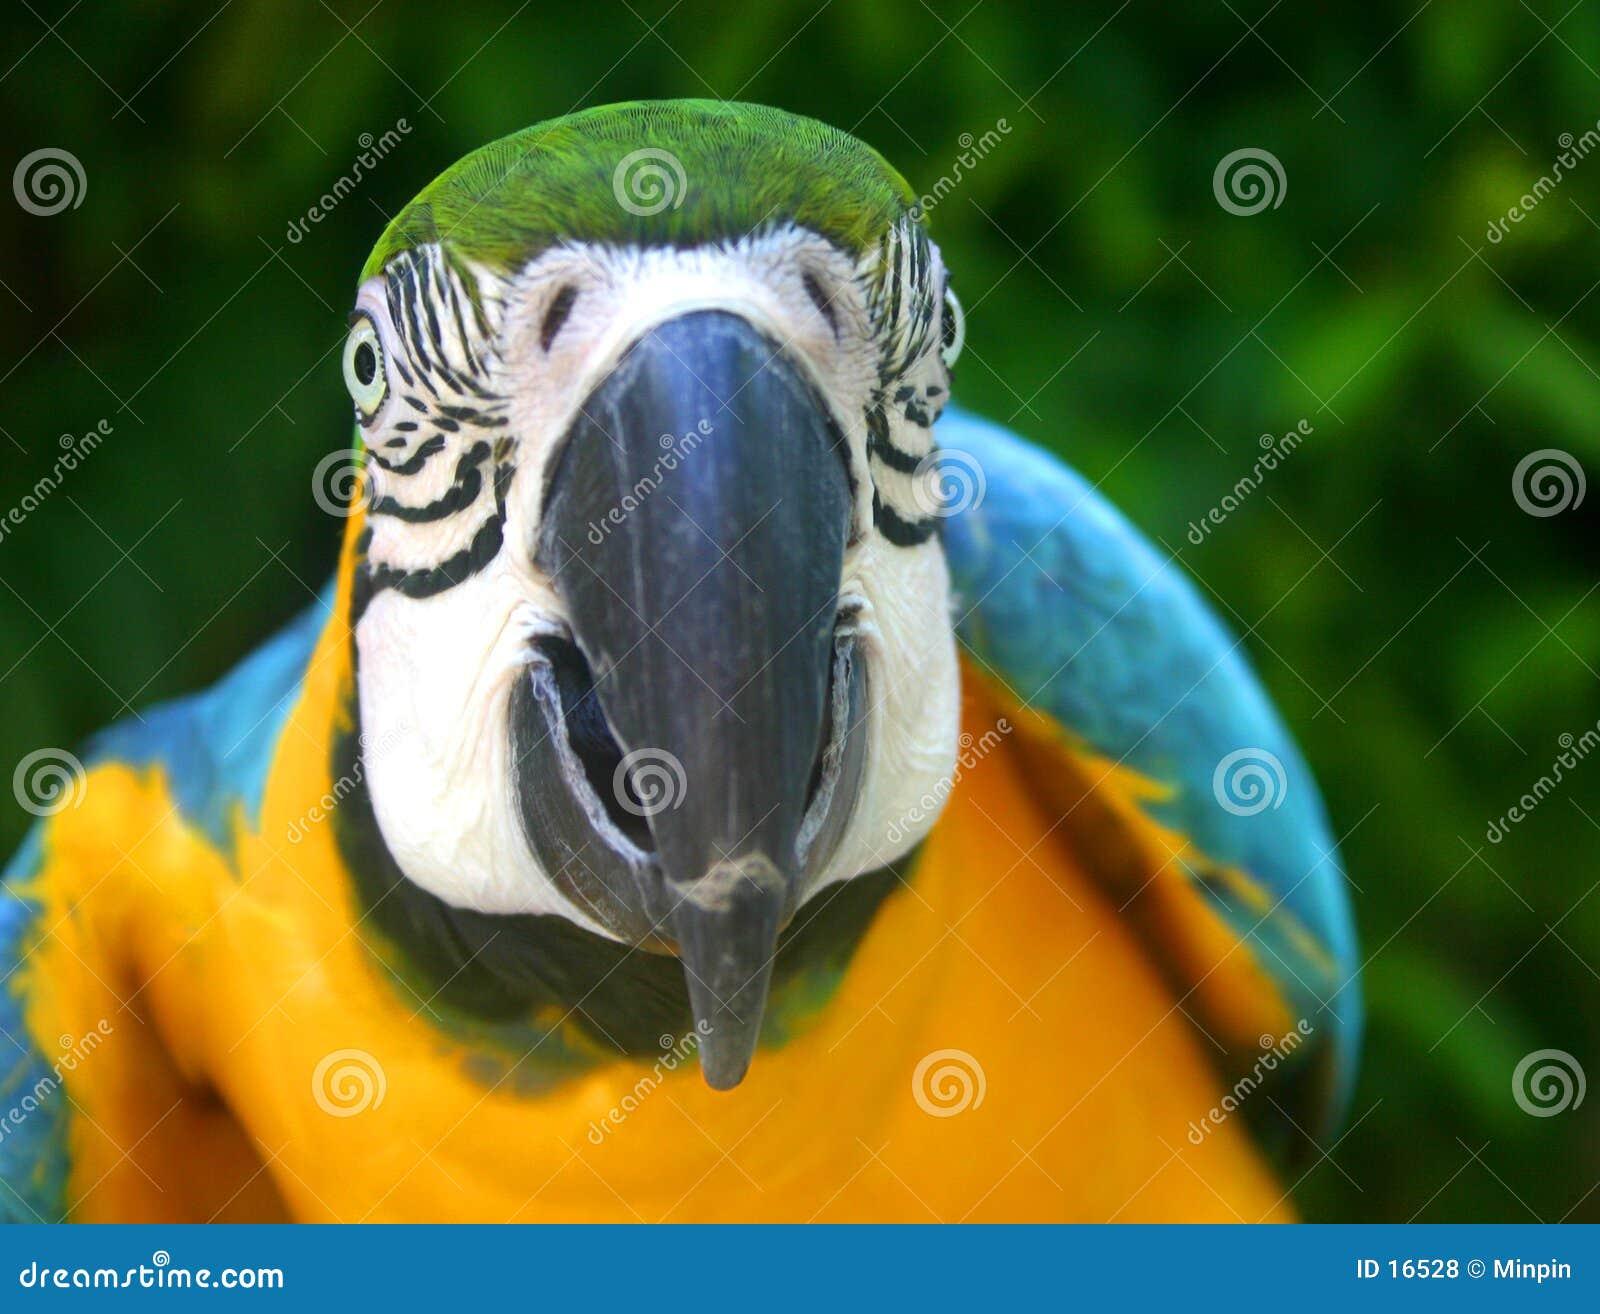 Macawpapegoja